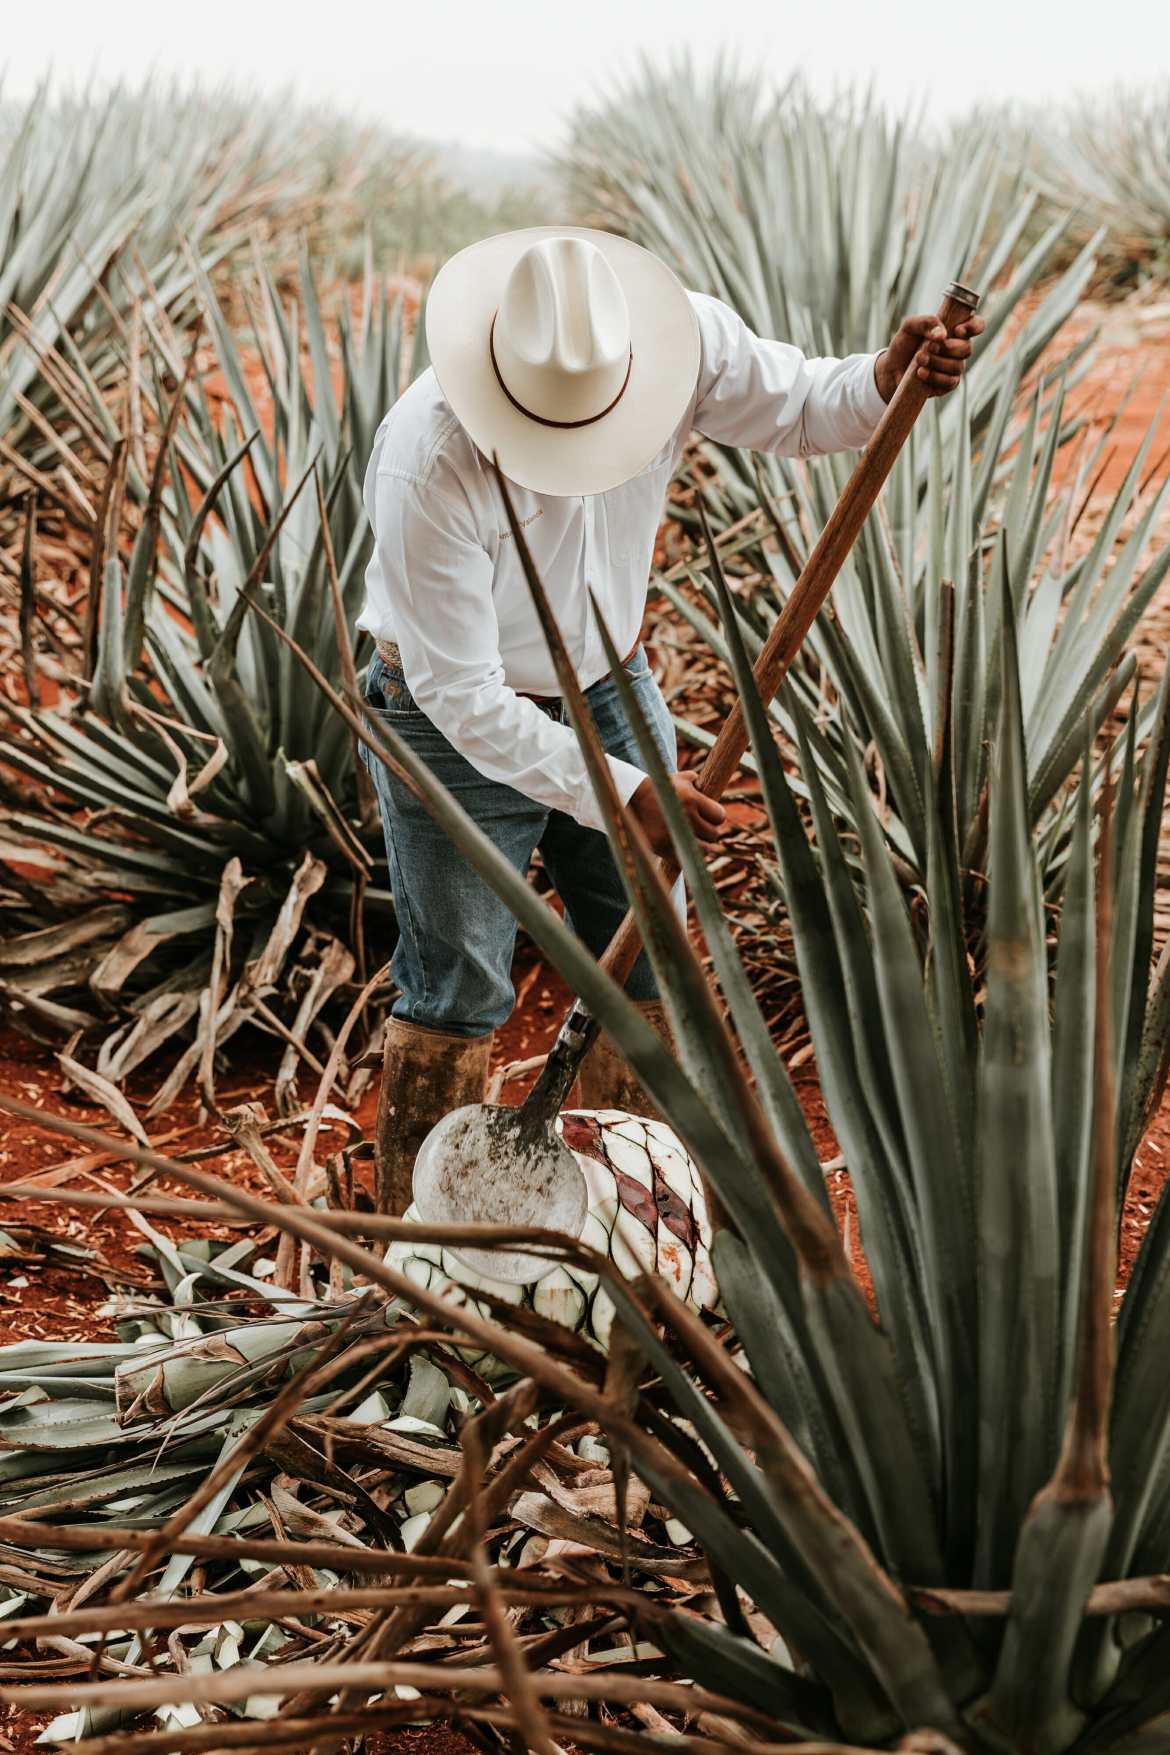 jimador cutting agave